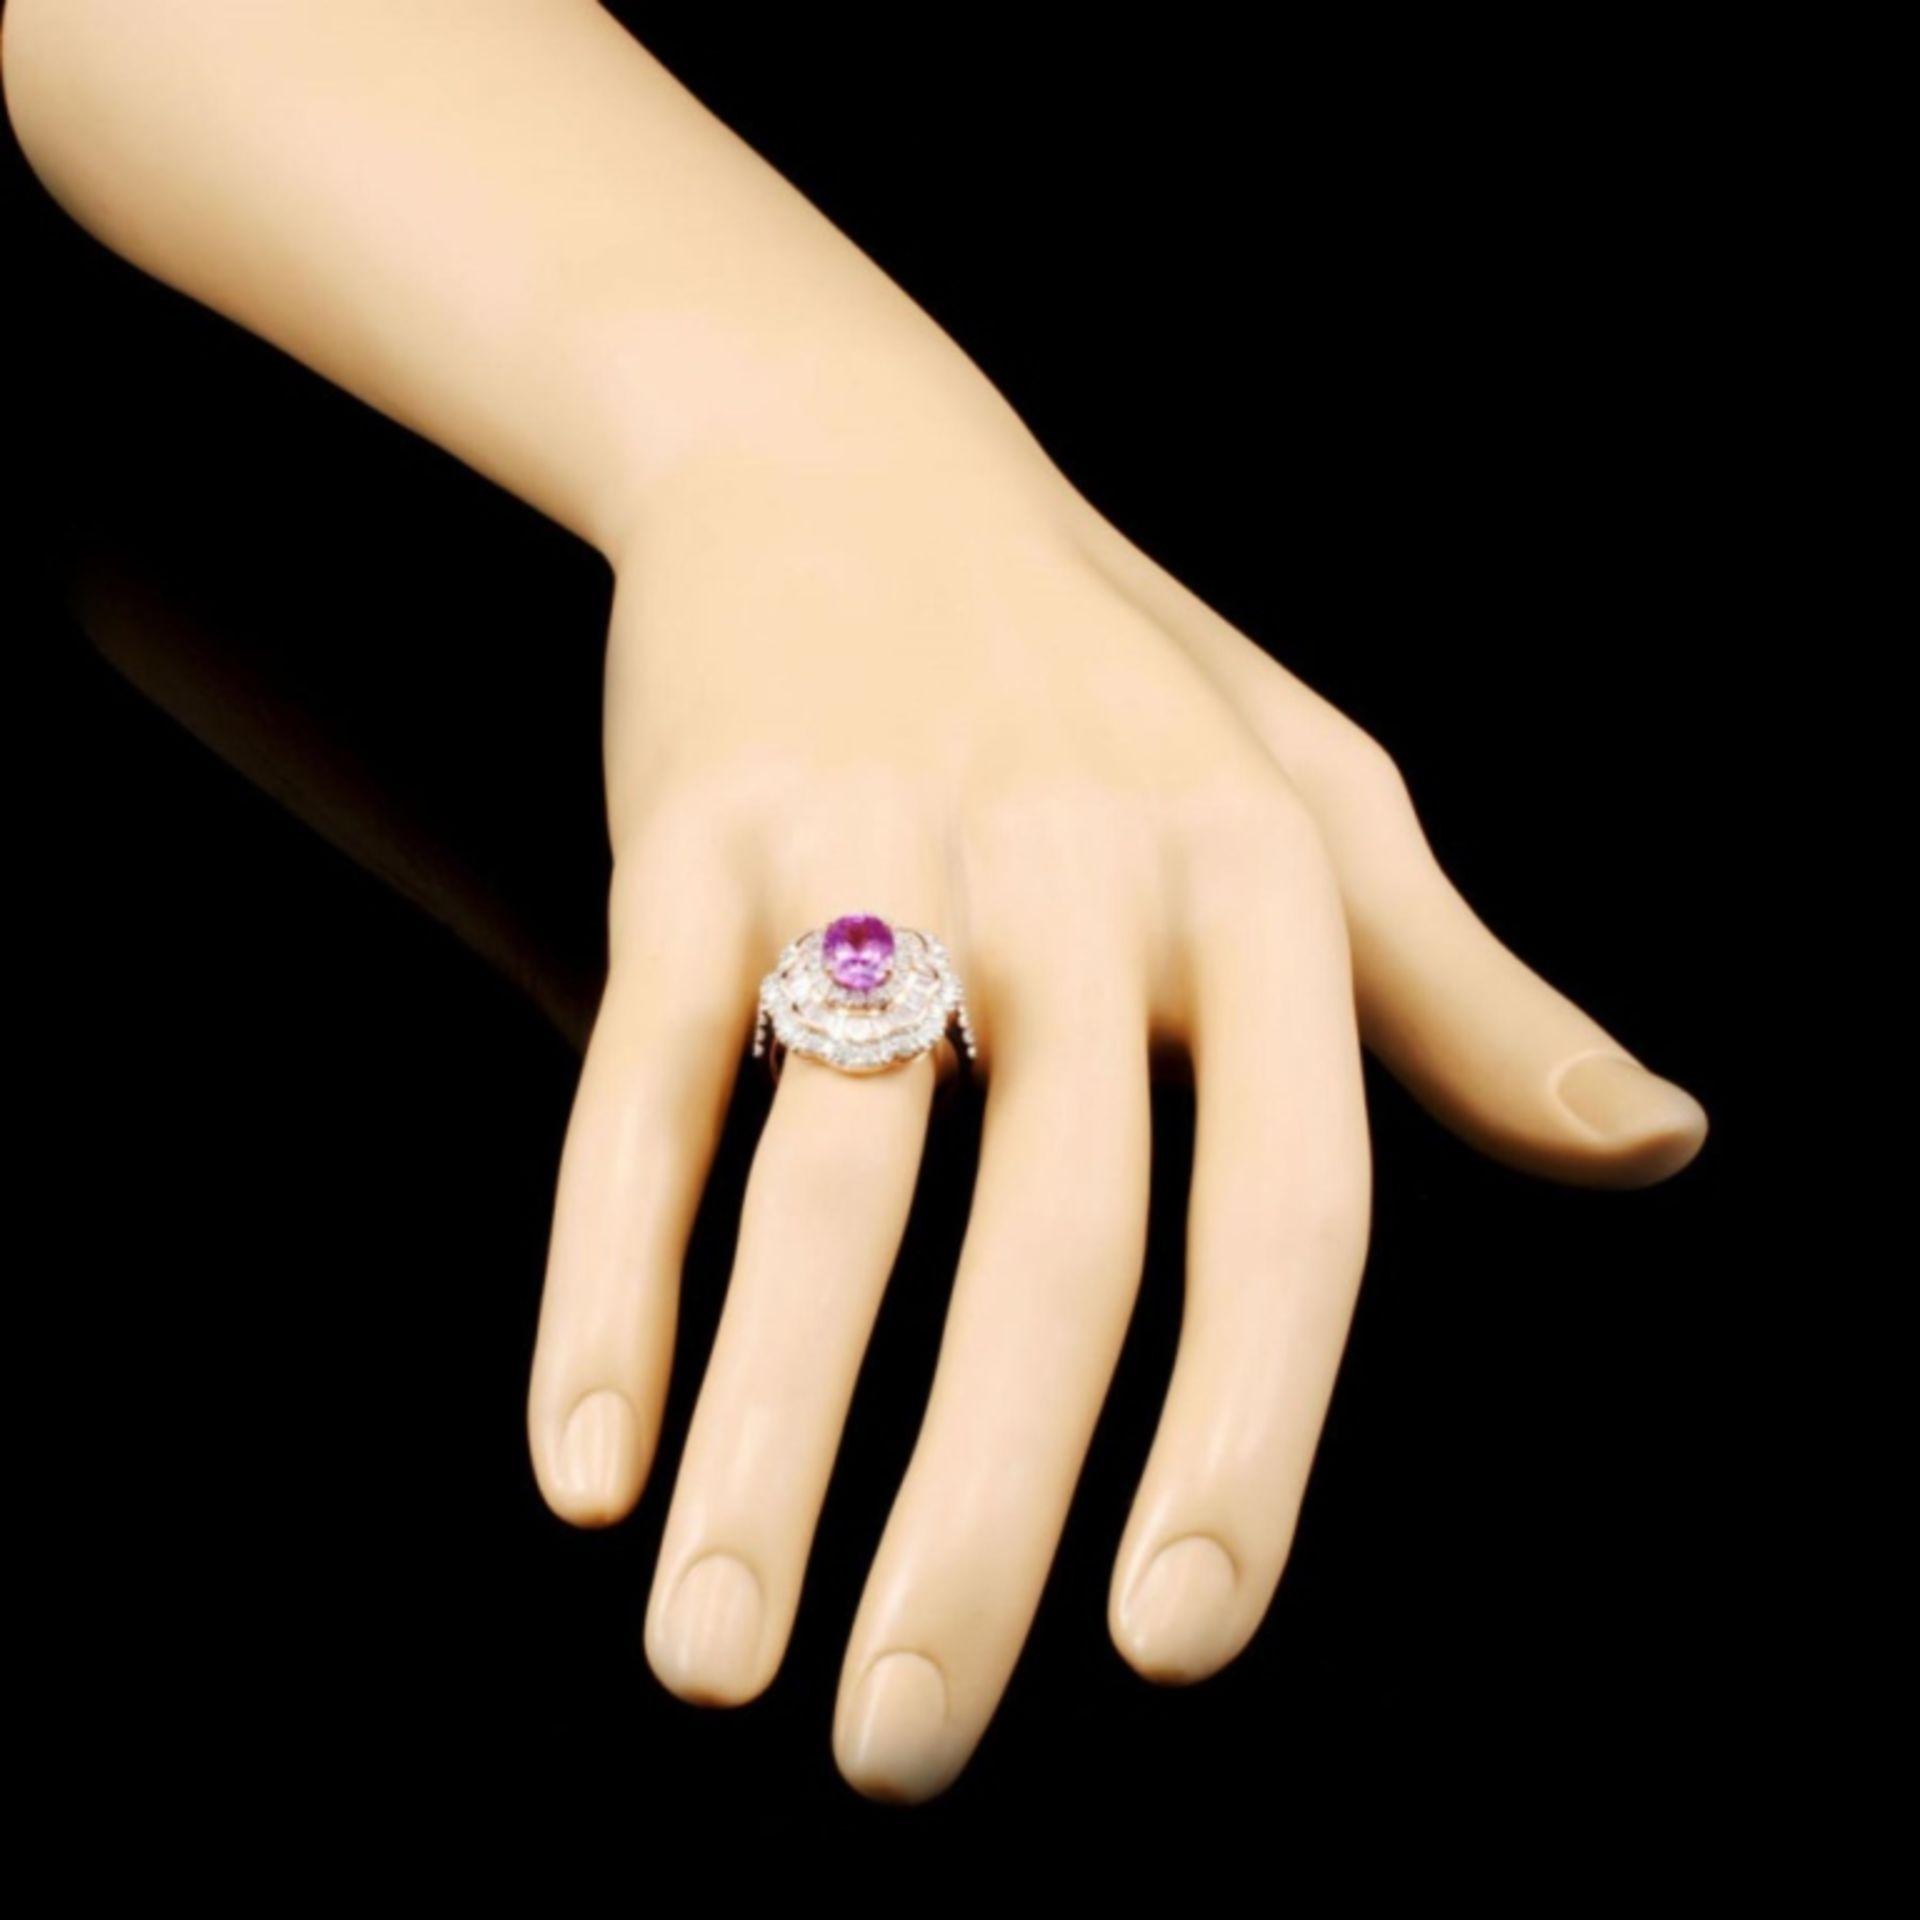 14K Gold 1.90ct Sapphire & 1.31ctw Diamond Ring - Image 3 of 5